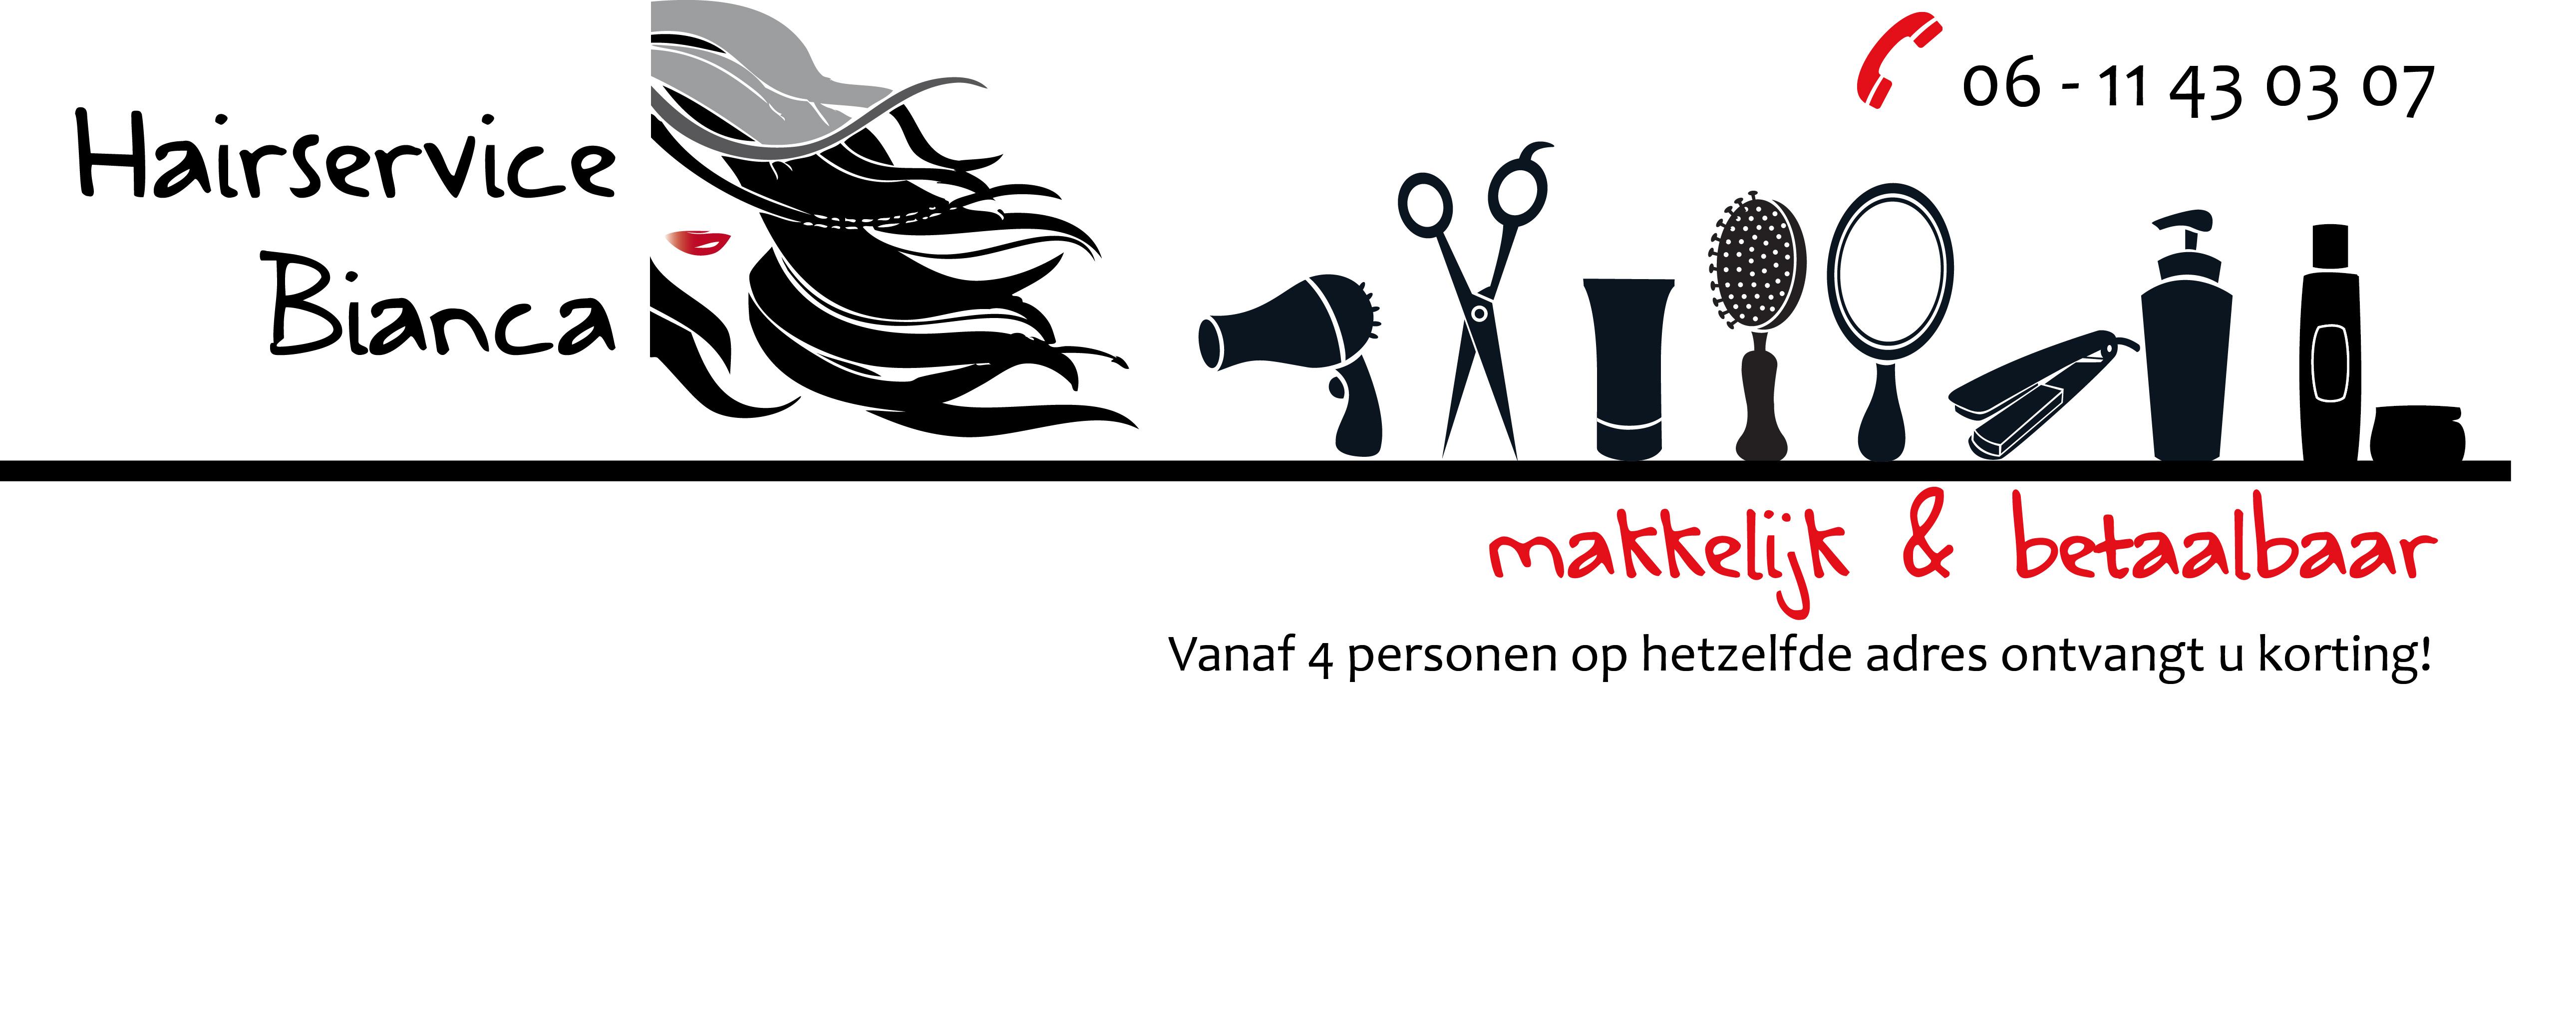 Facebook Banner Hairservice Bianca